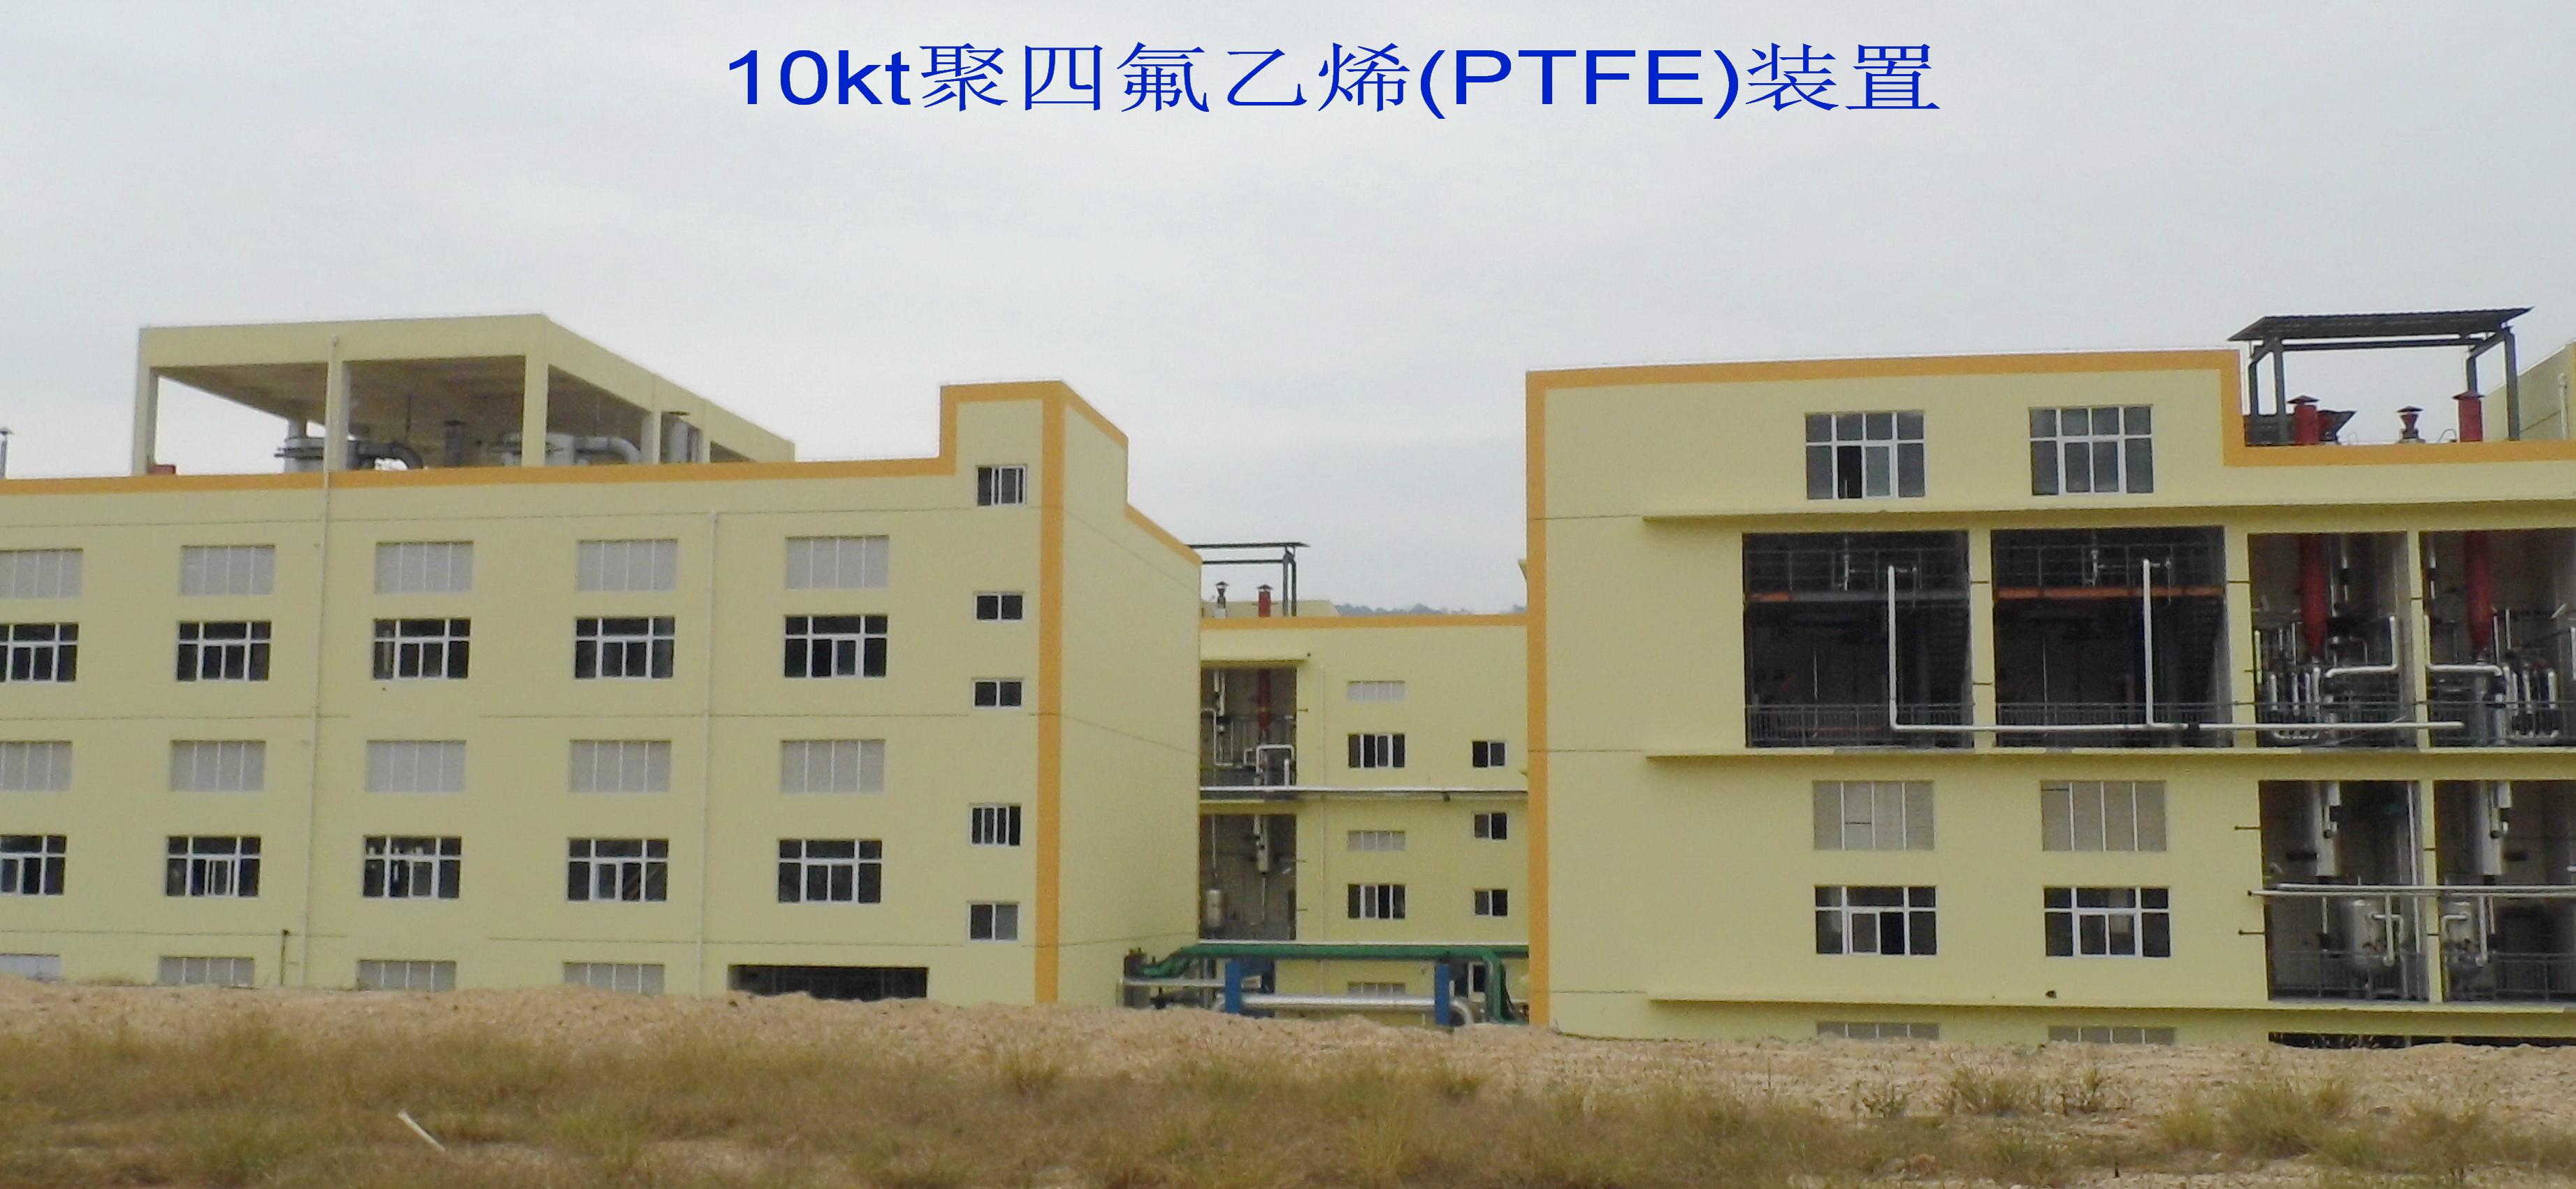 10kt聚四氟乙烯-PTFE装置